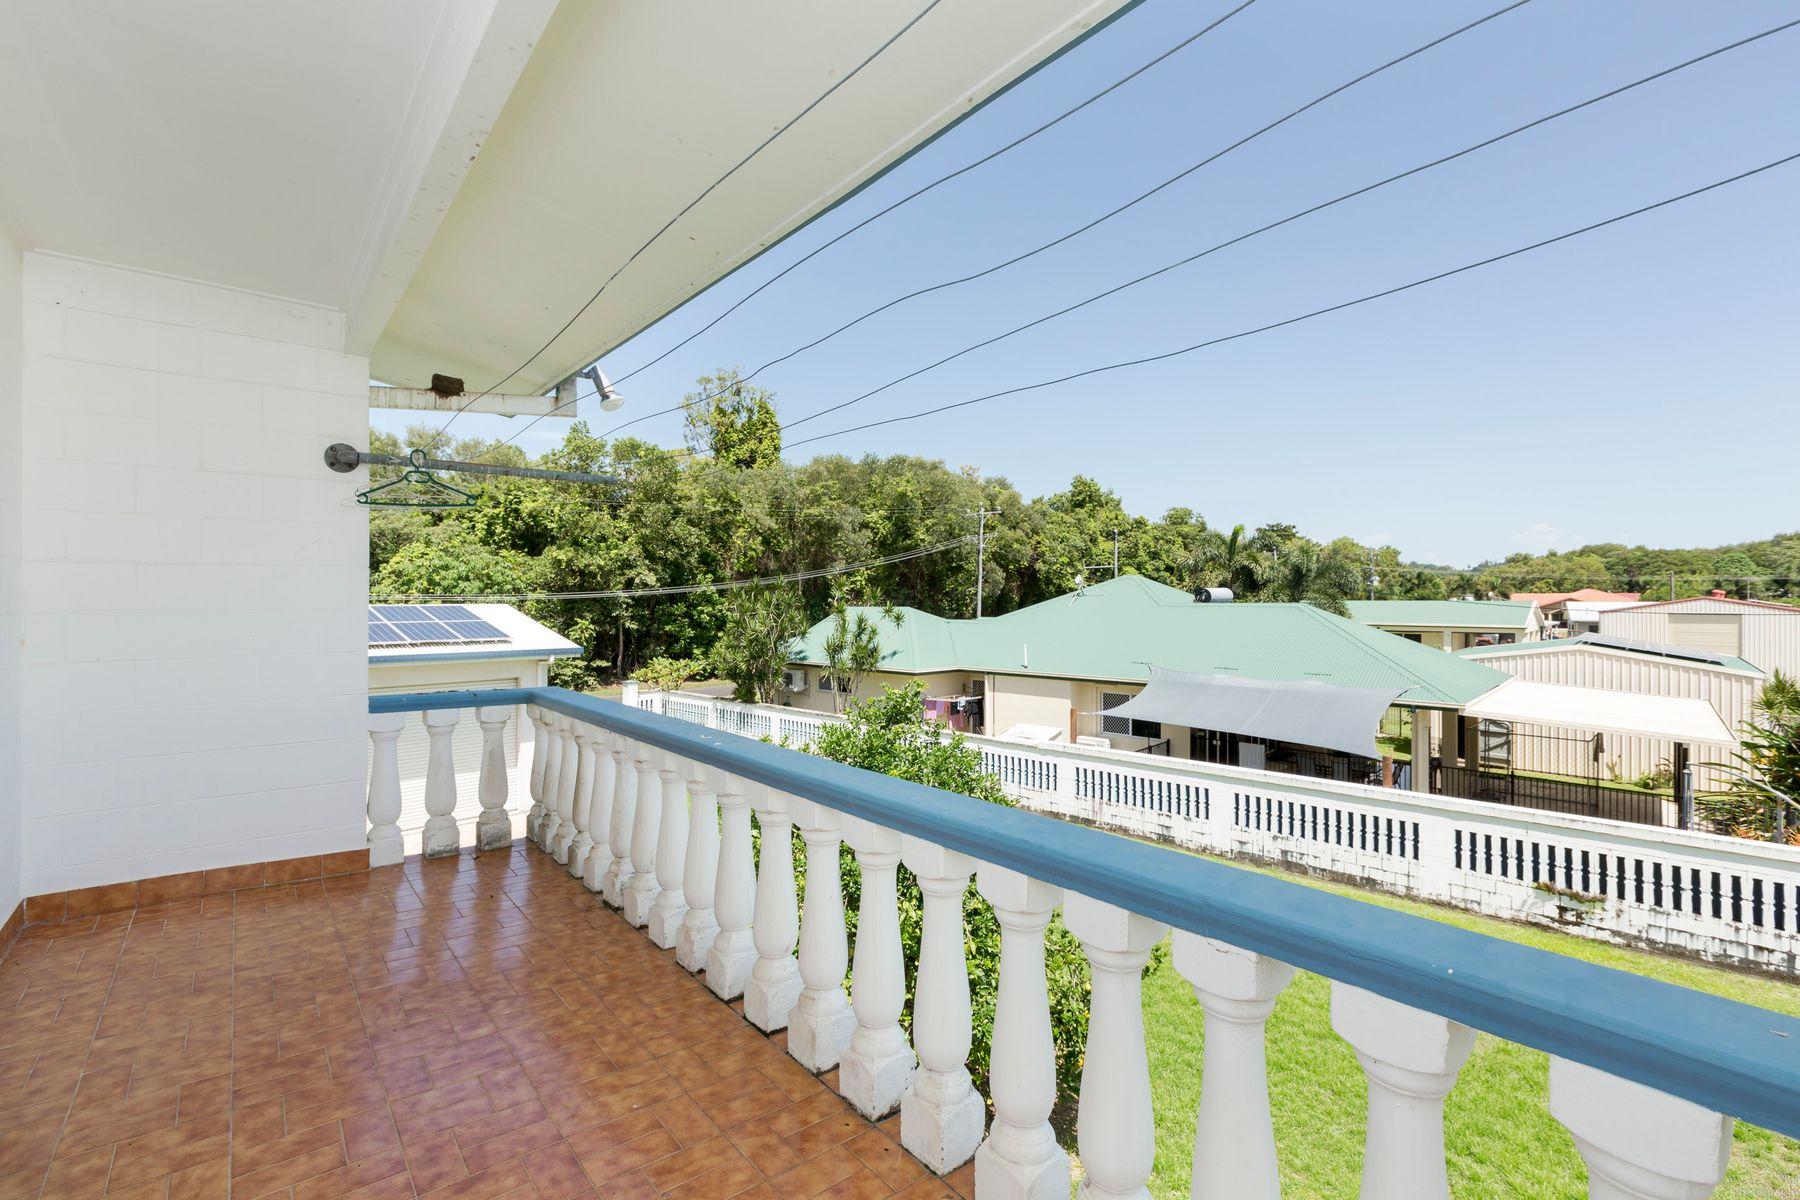 64 Jacobs Road, Kurrimine Beach, QLD 4871